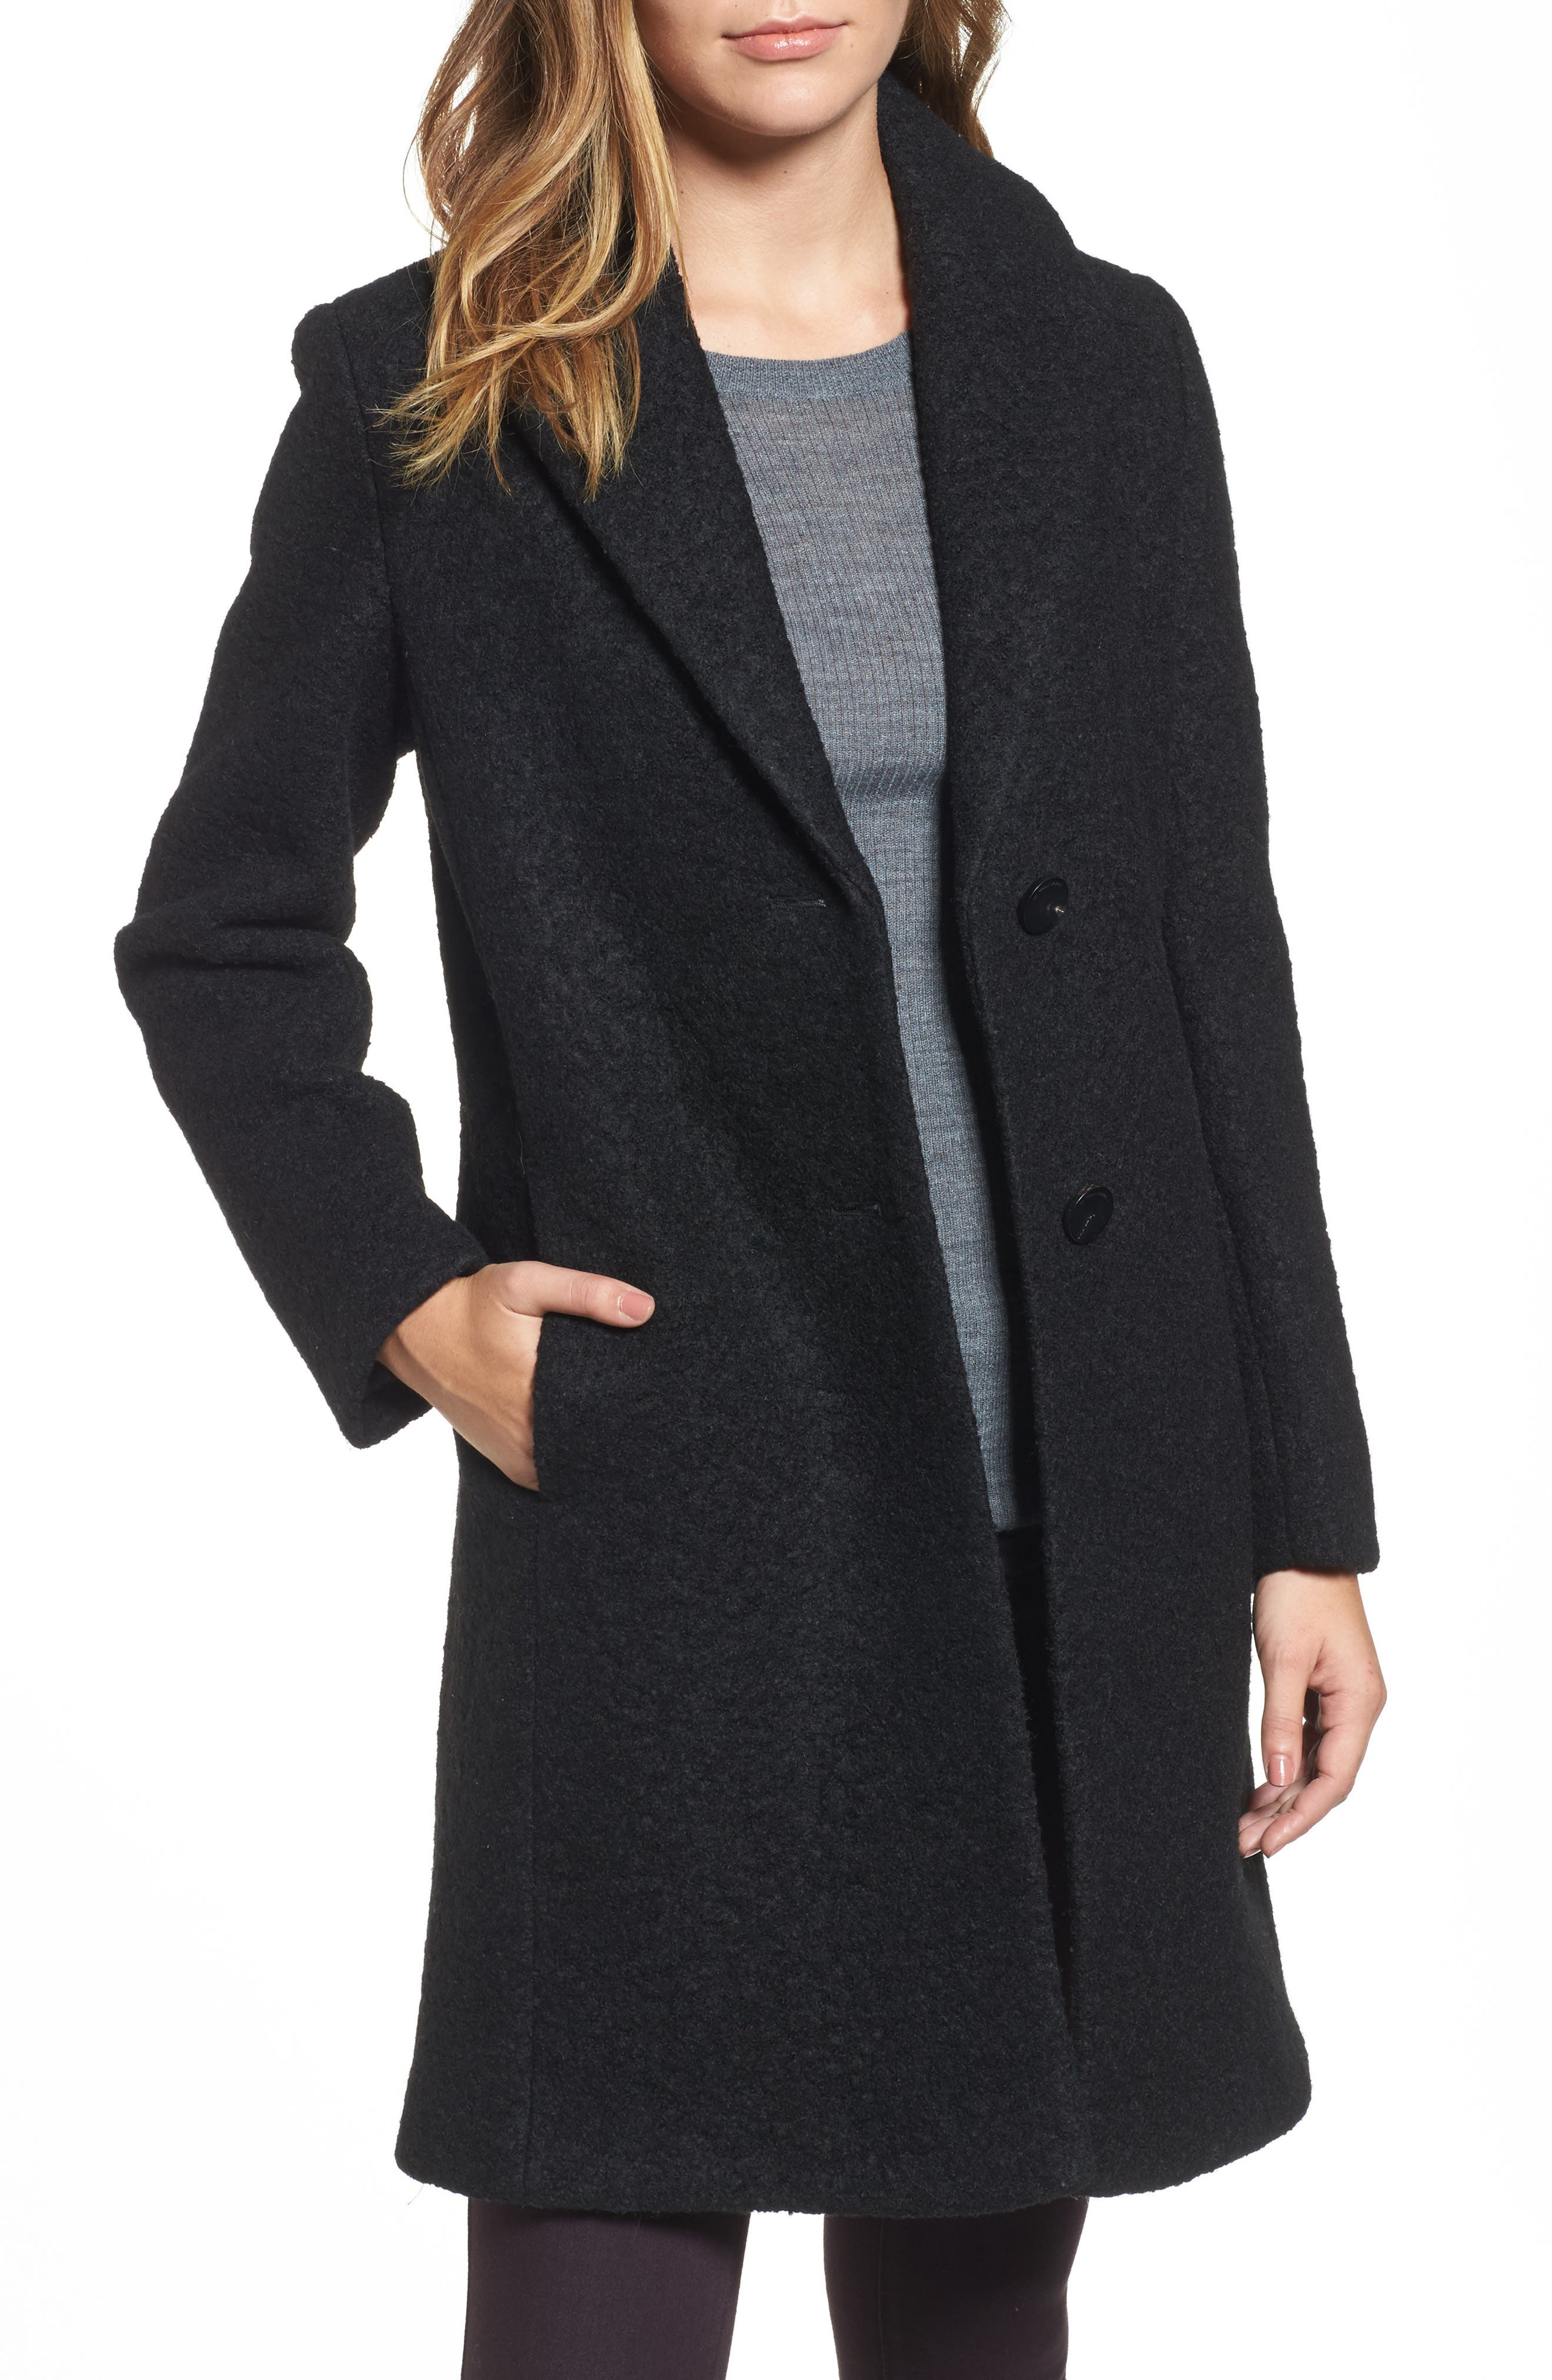 'Tessa' Boiled Wool Blend Coat,                             Main thumbnail 1, color,                             001